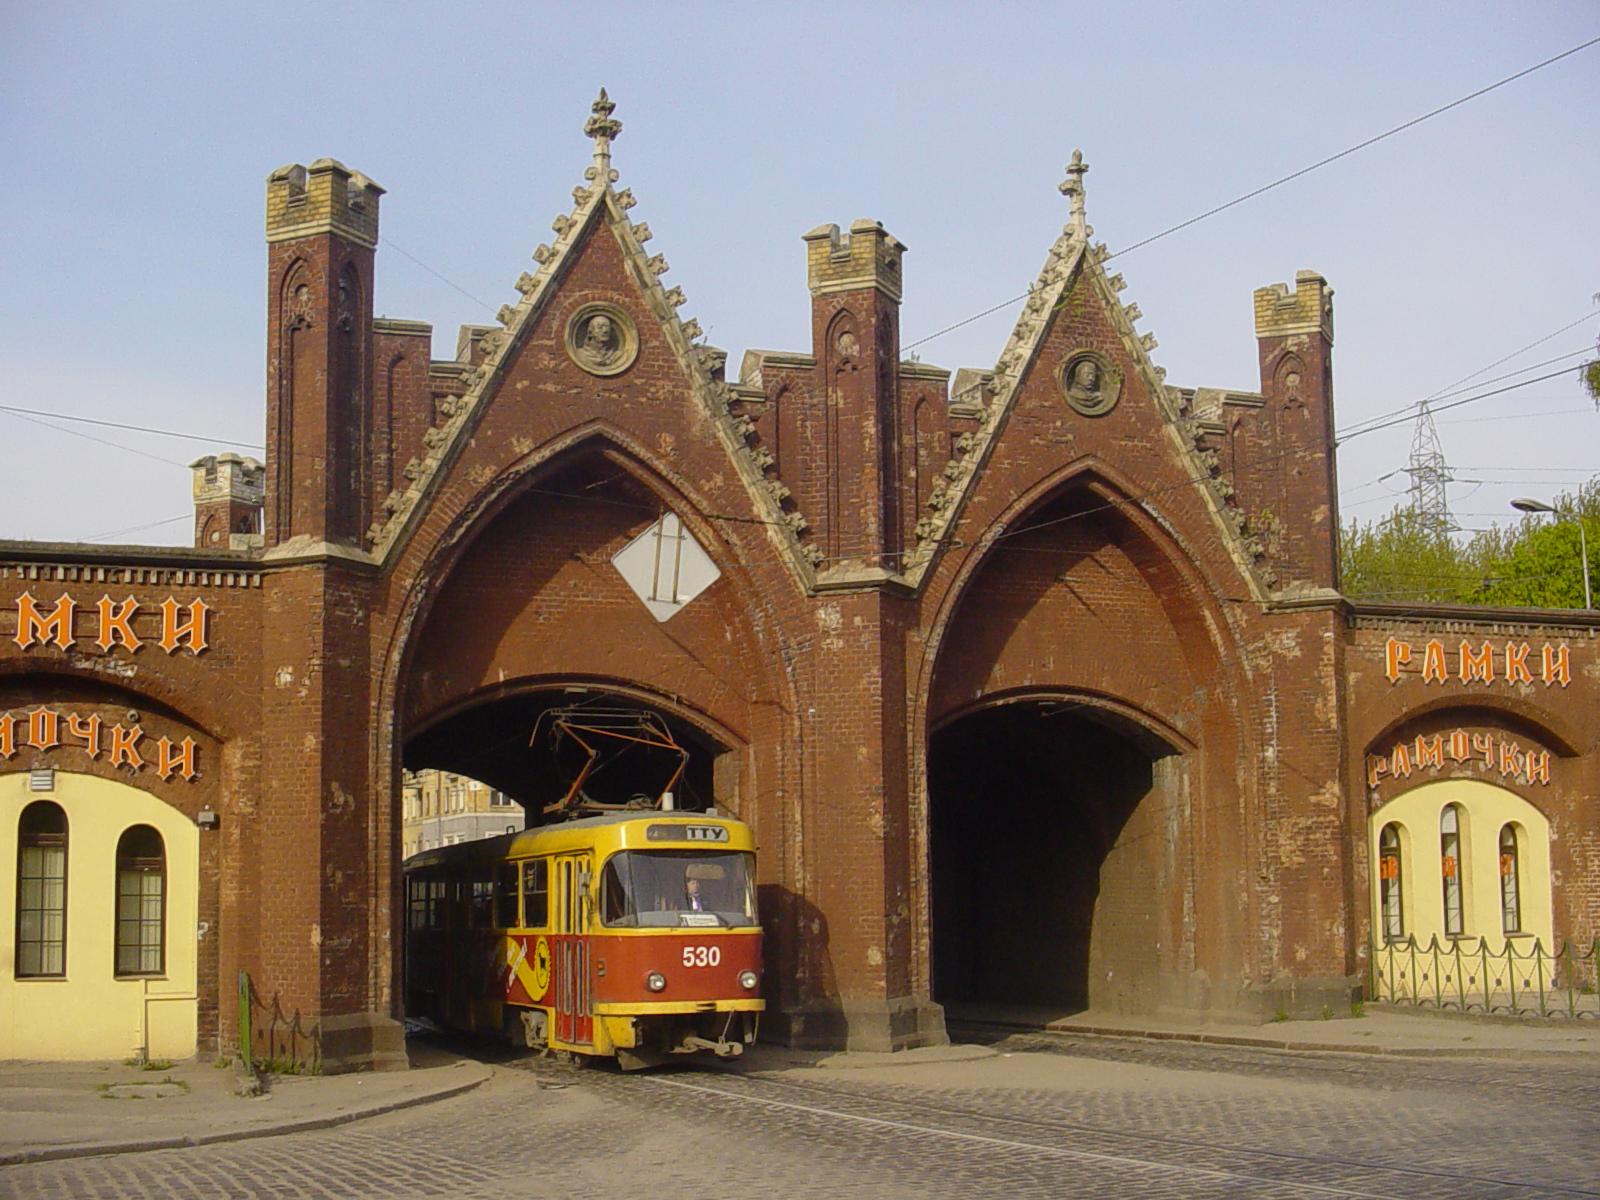 File:Kaliningrad Brandenburg Gate.JPG - Wikipedia, the free ...: en.wikipedia.org/wiki/file:kaliningrad_brandenburg_gate.jpg